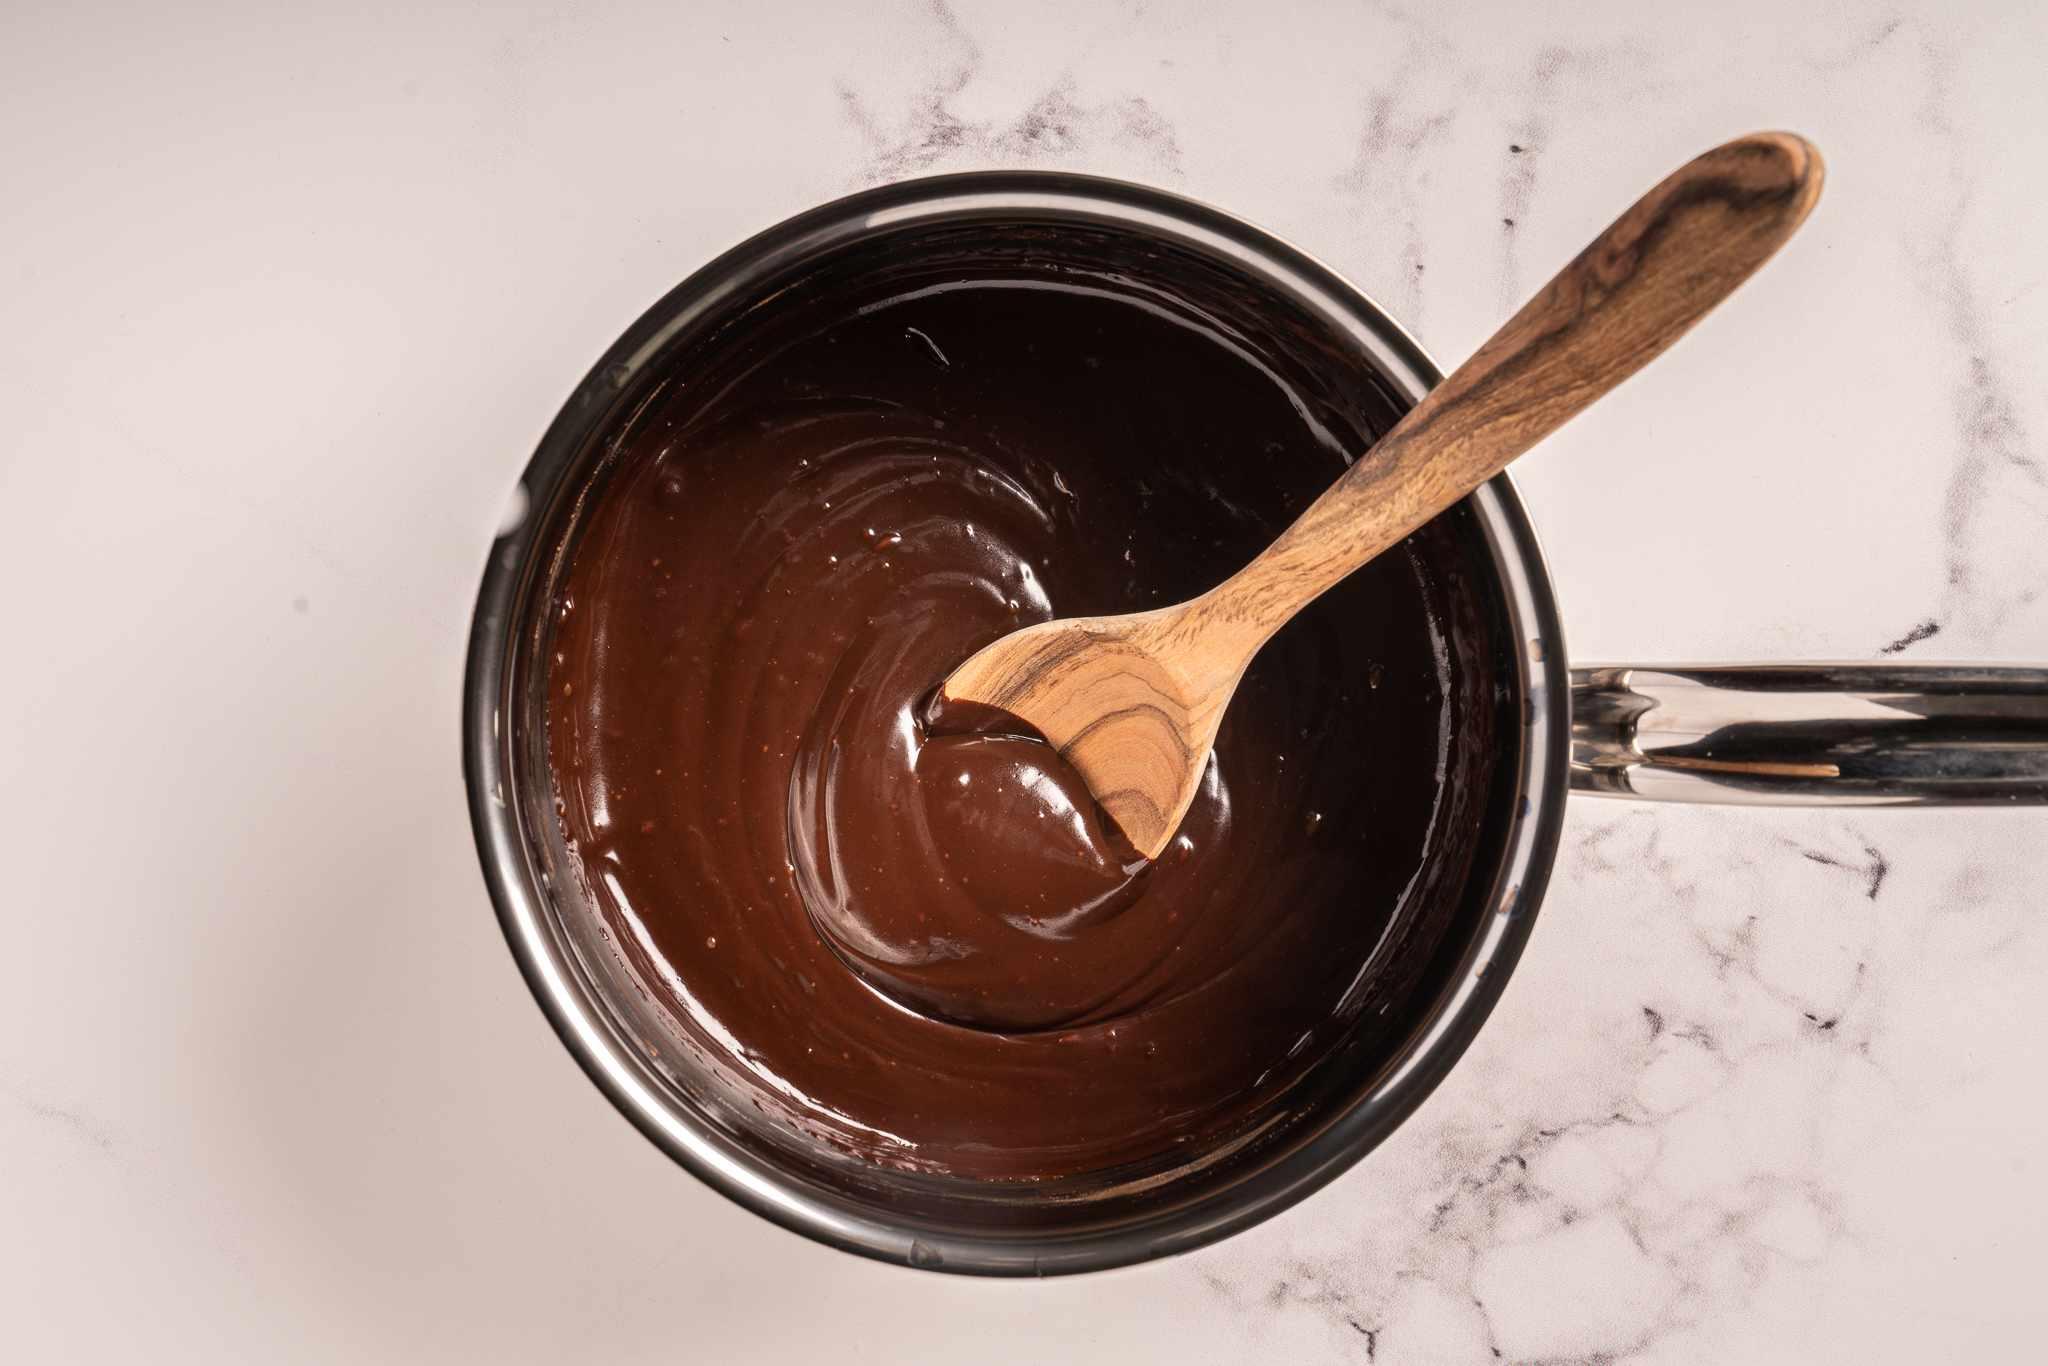 Vegan Dairy-Free Chocolate Ganache in a saucepan